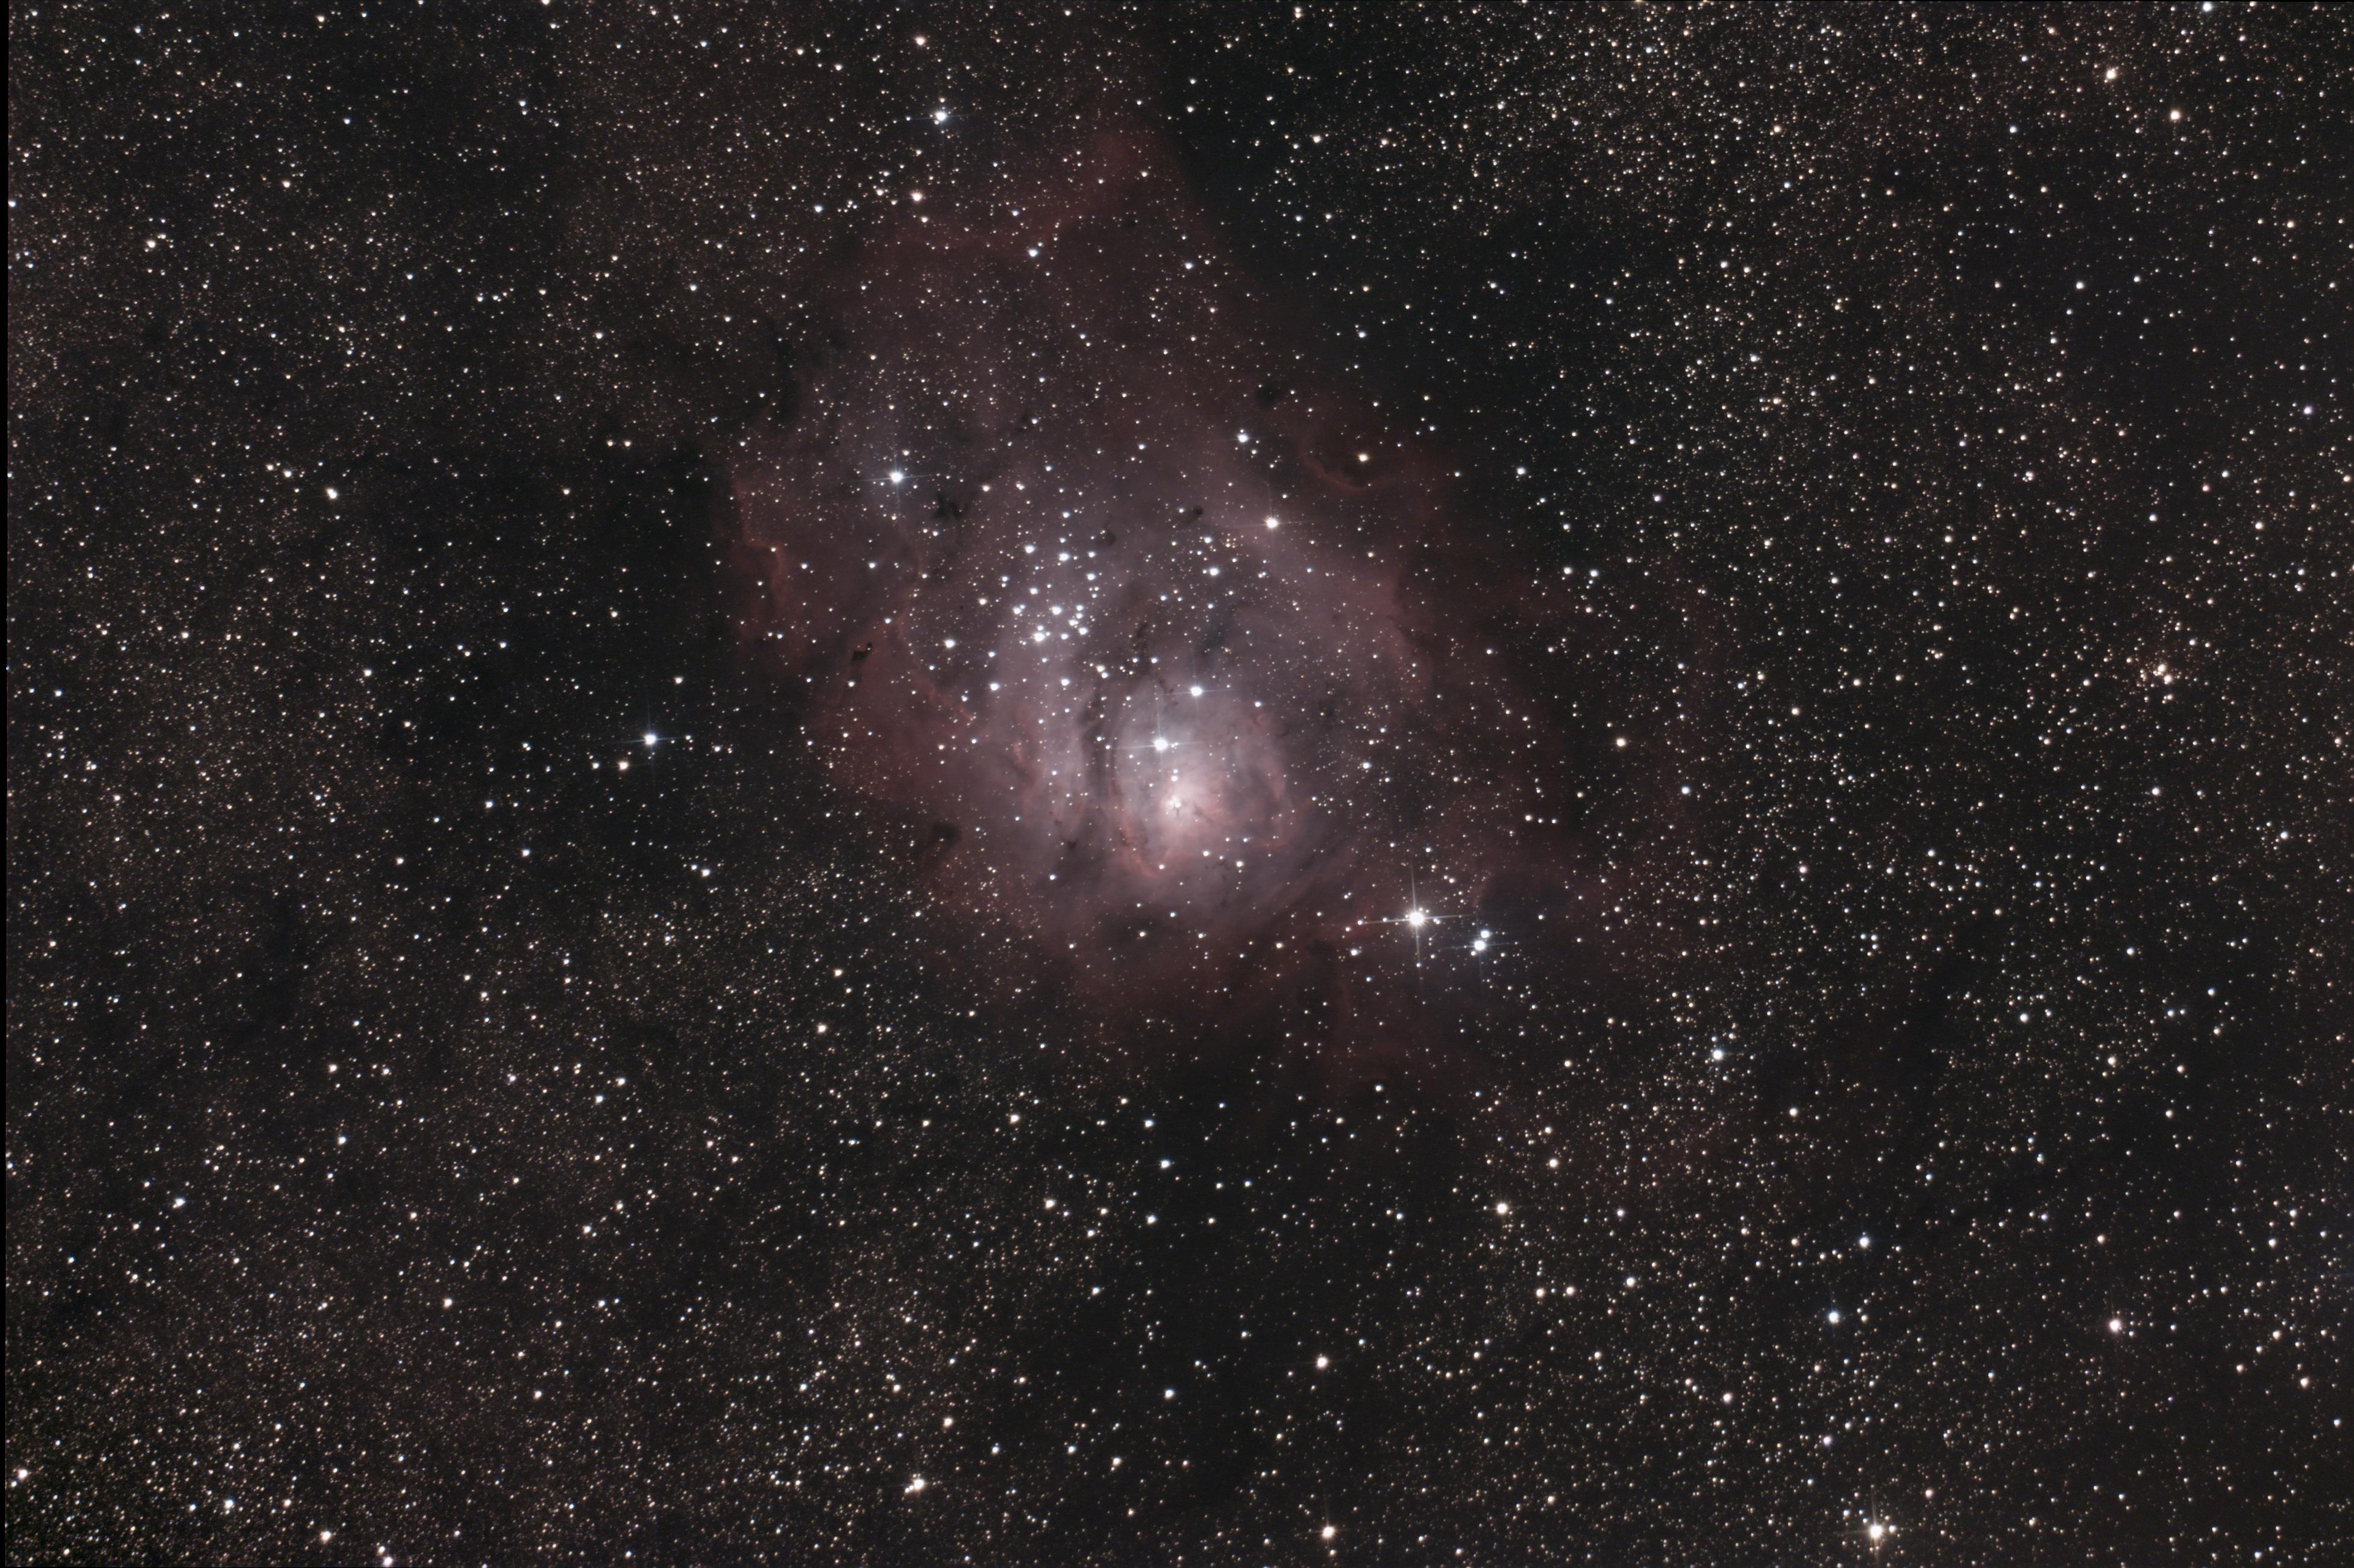 M8 & la comète C/2020 F3 NEOWISE 0010-M8-NebuleuseDeLaLagune-fin